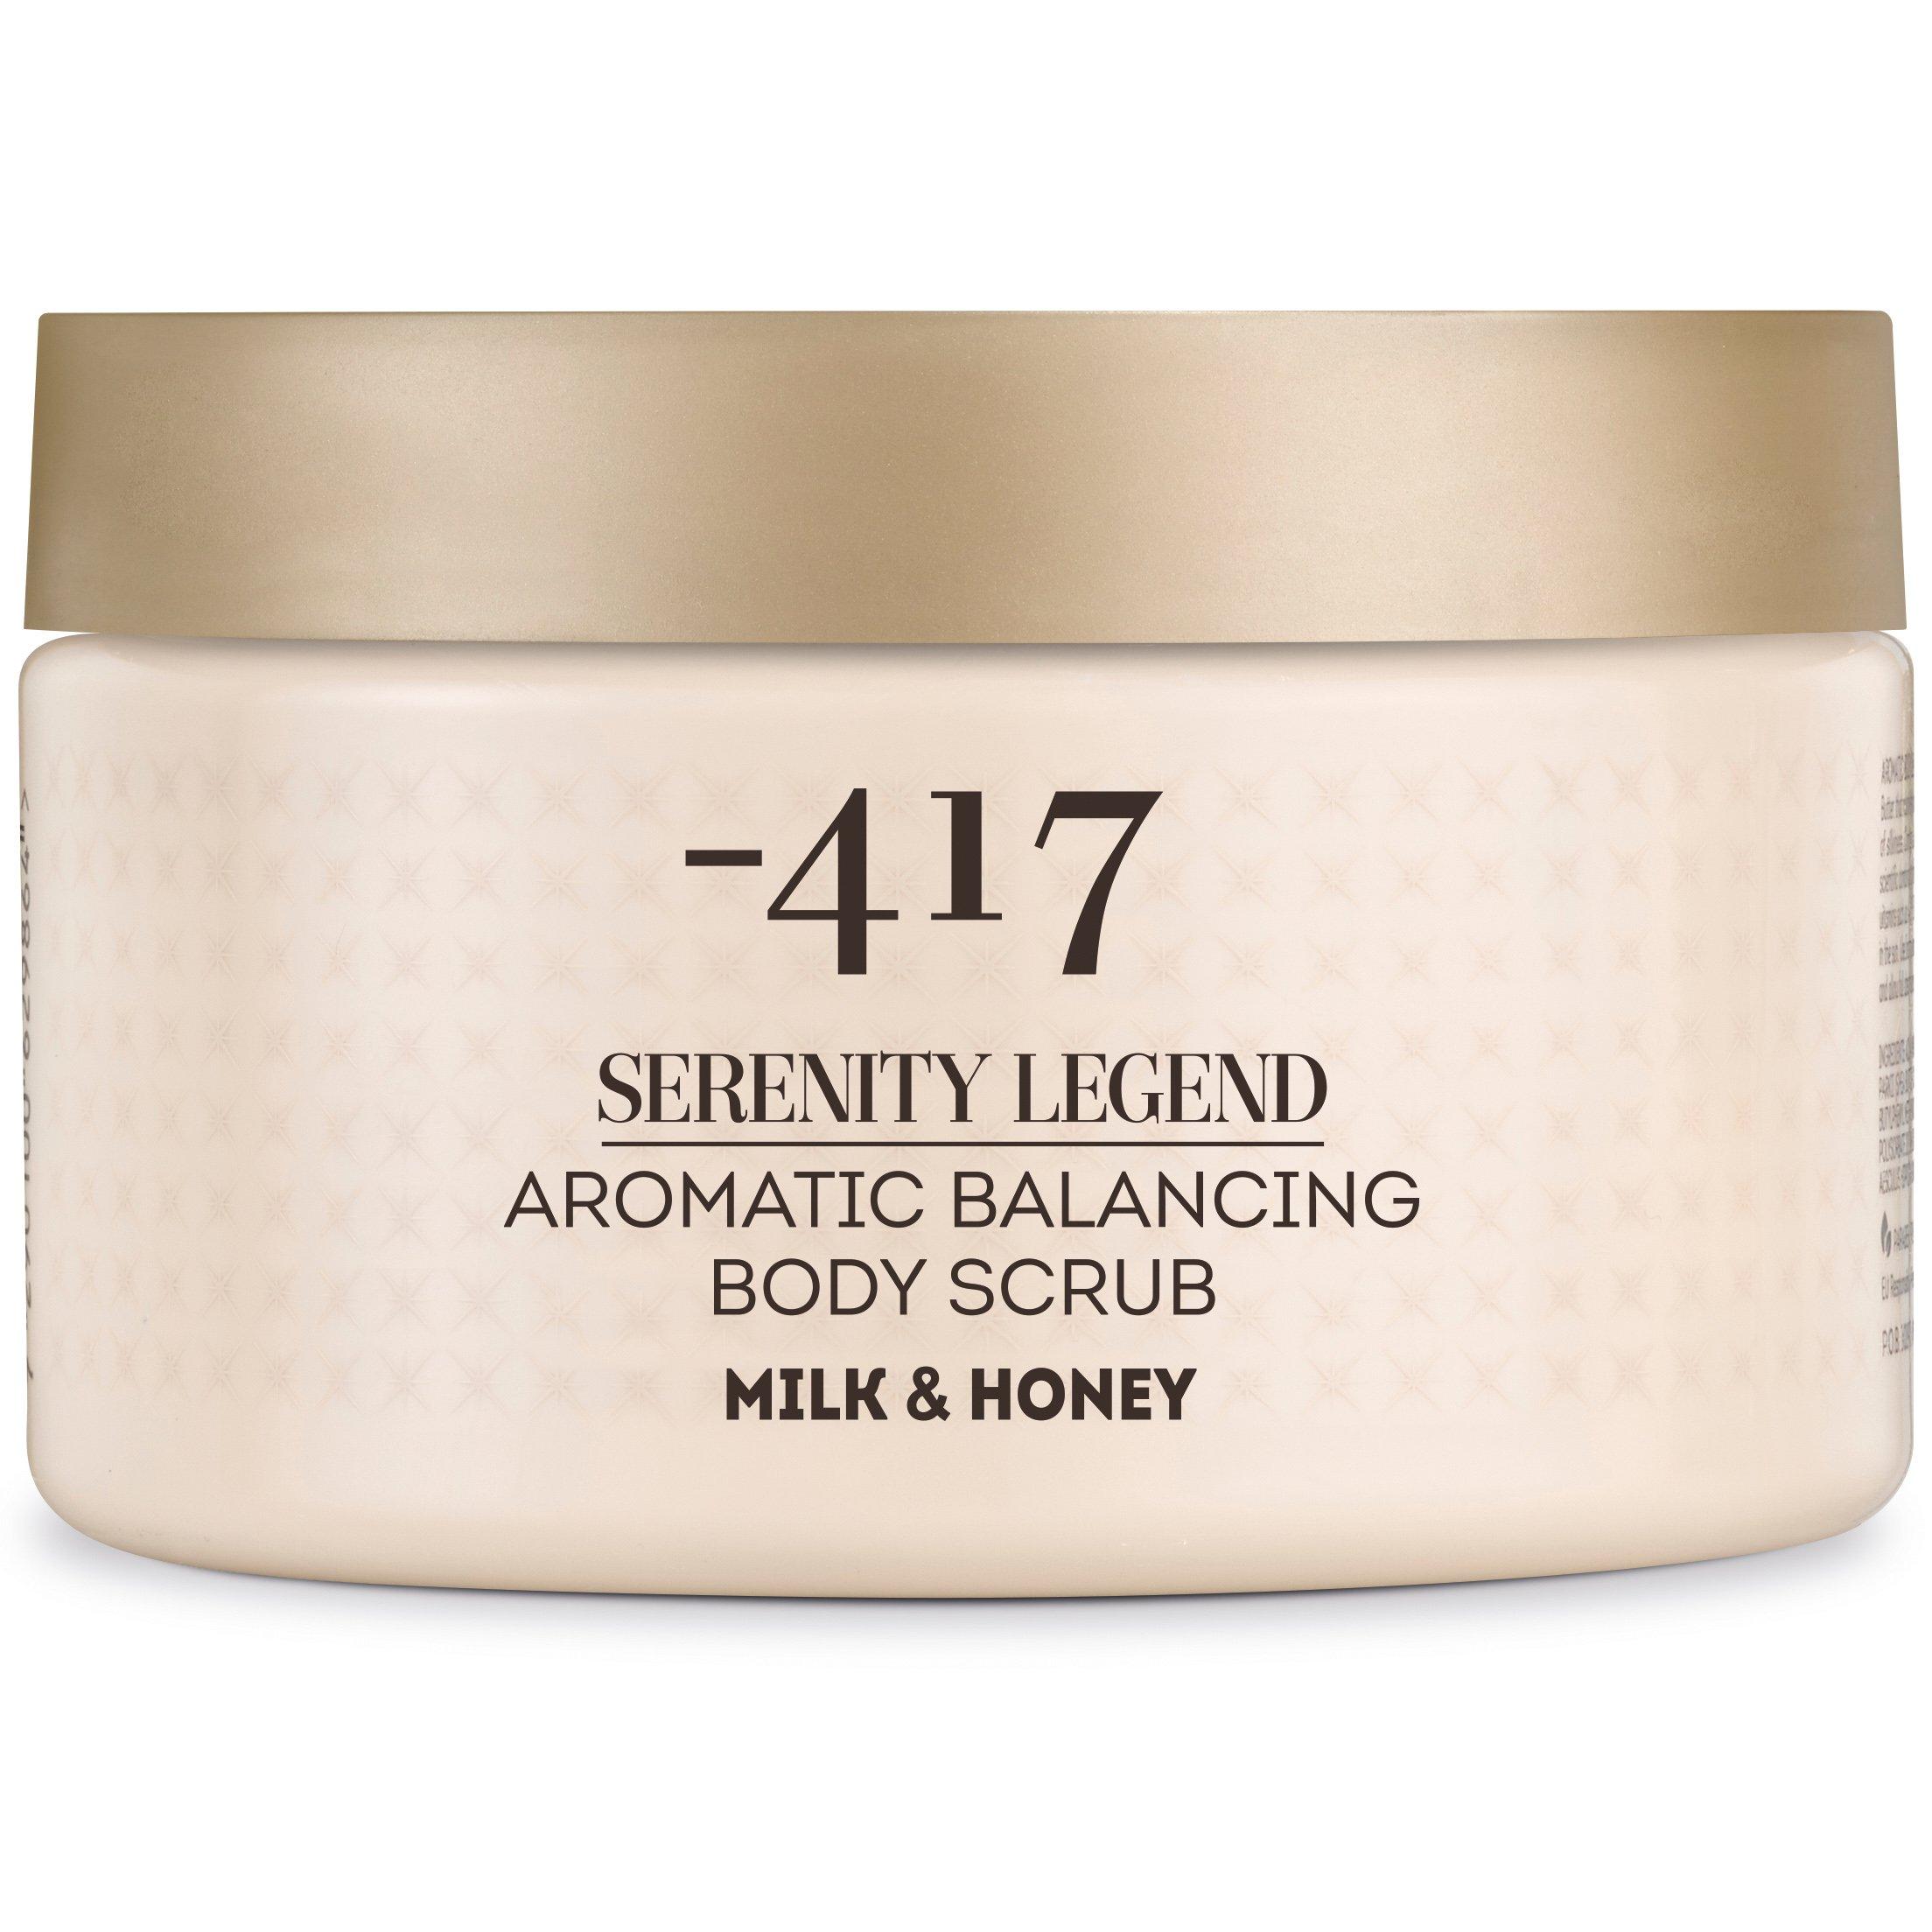 Minus 417 Serenity Legend Aromatic Balancing Body Scrub Milk Honey Απαλό Αρωματικό Scrub Σώματος 450gr